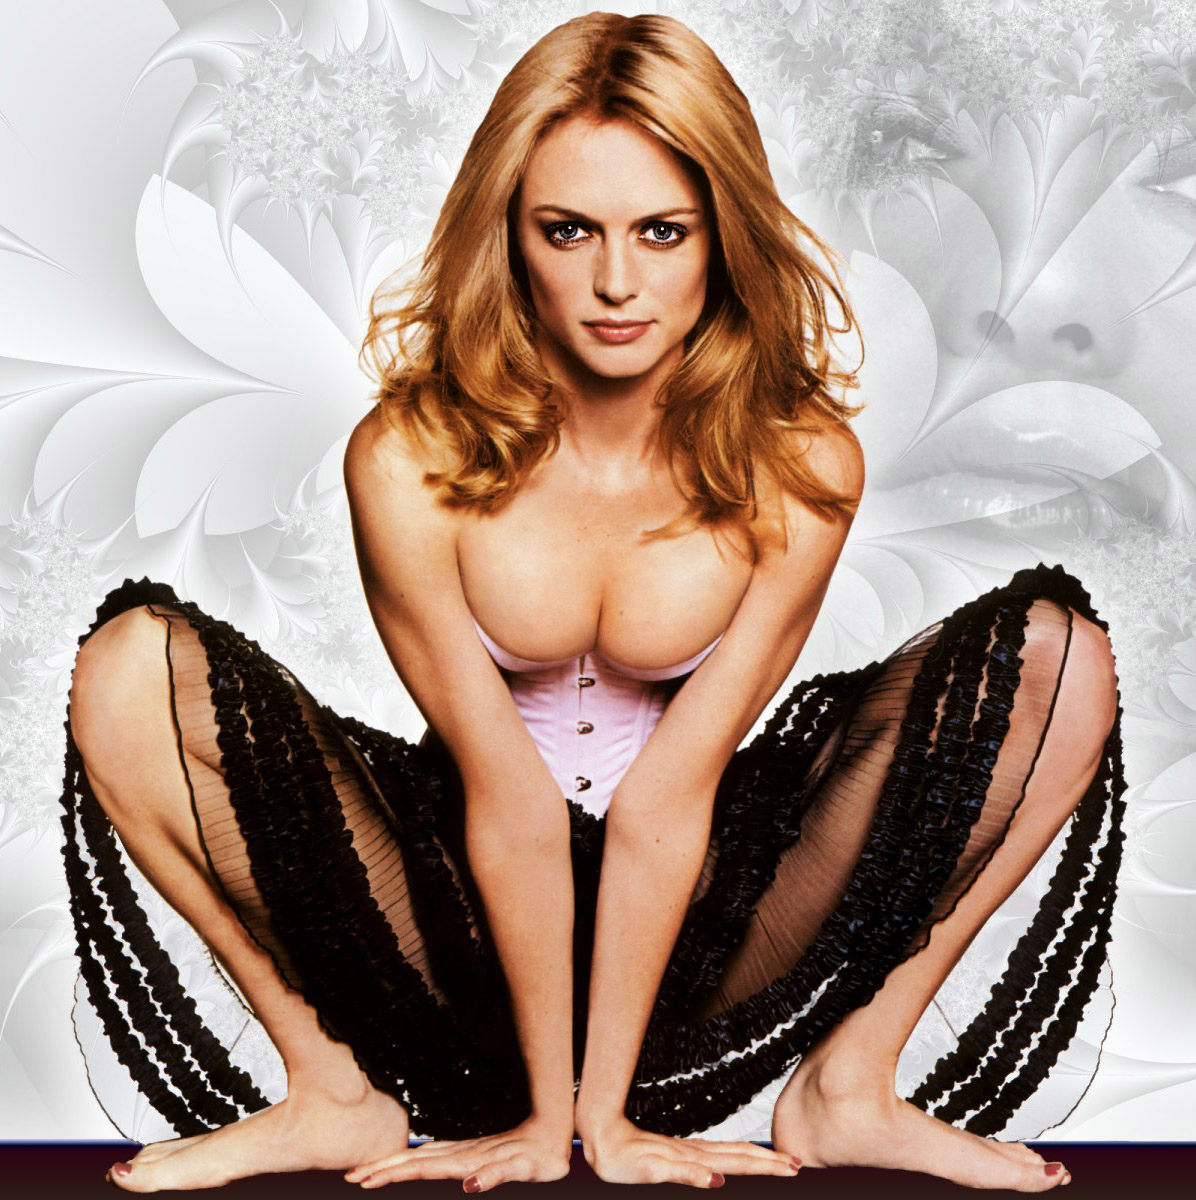 http://1.bp.blogspot.com/-SV7byl7aa9w/TbbwRDXDIKI/AAAAAAAAA80/ctkmzTMy778/s1600/hg8.jpg